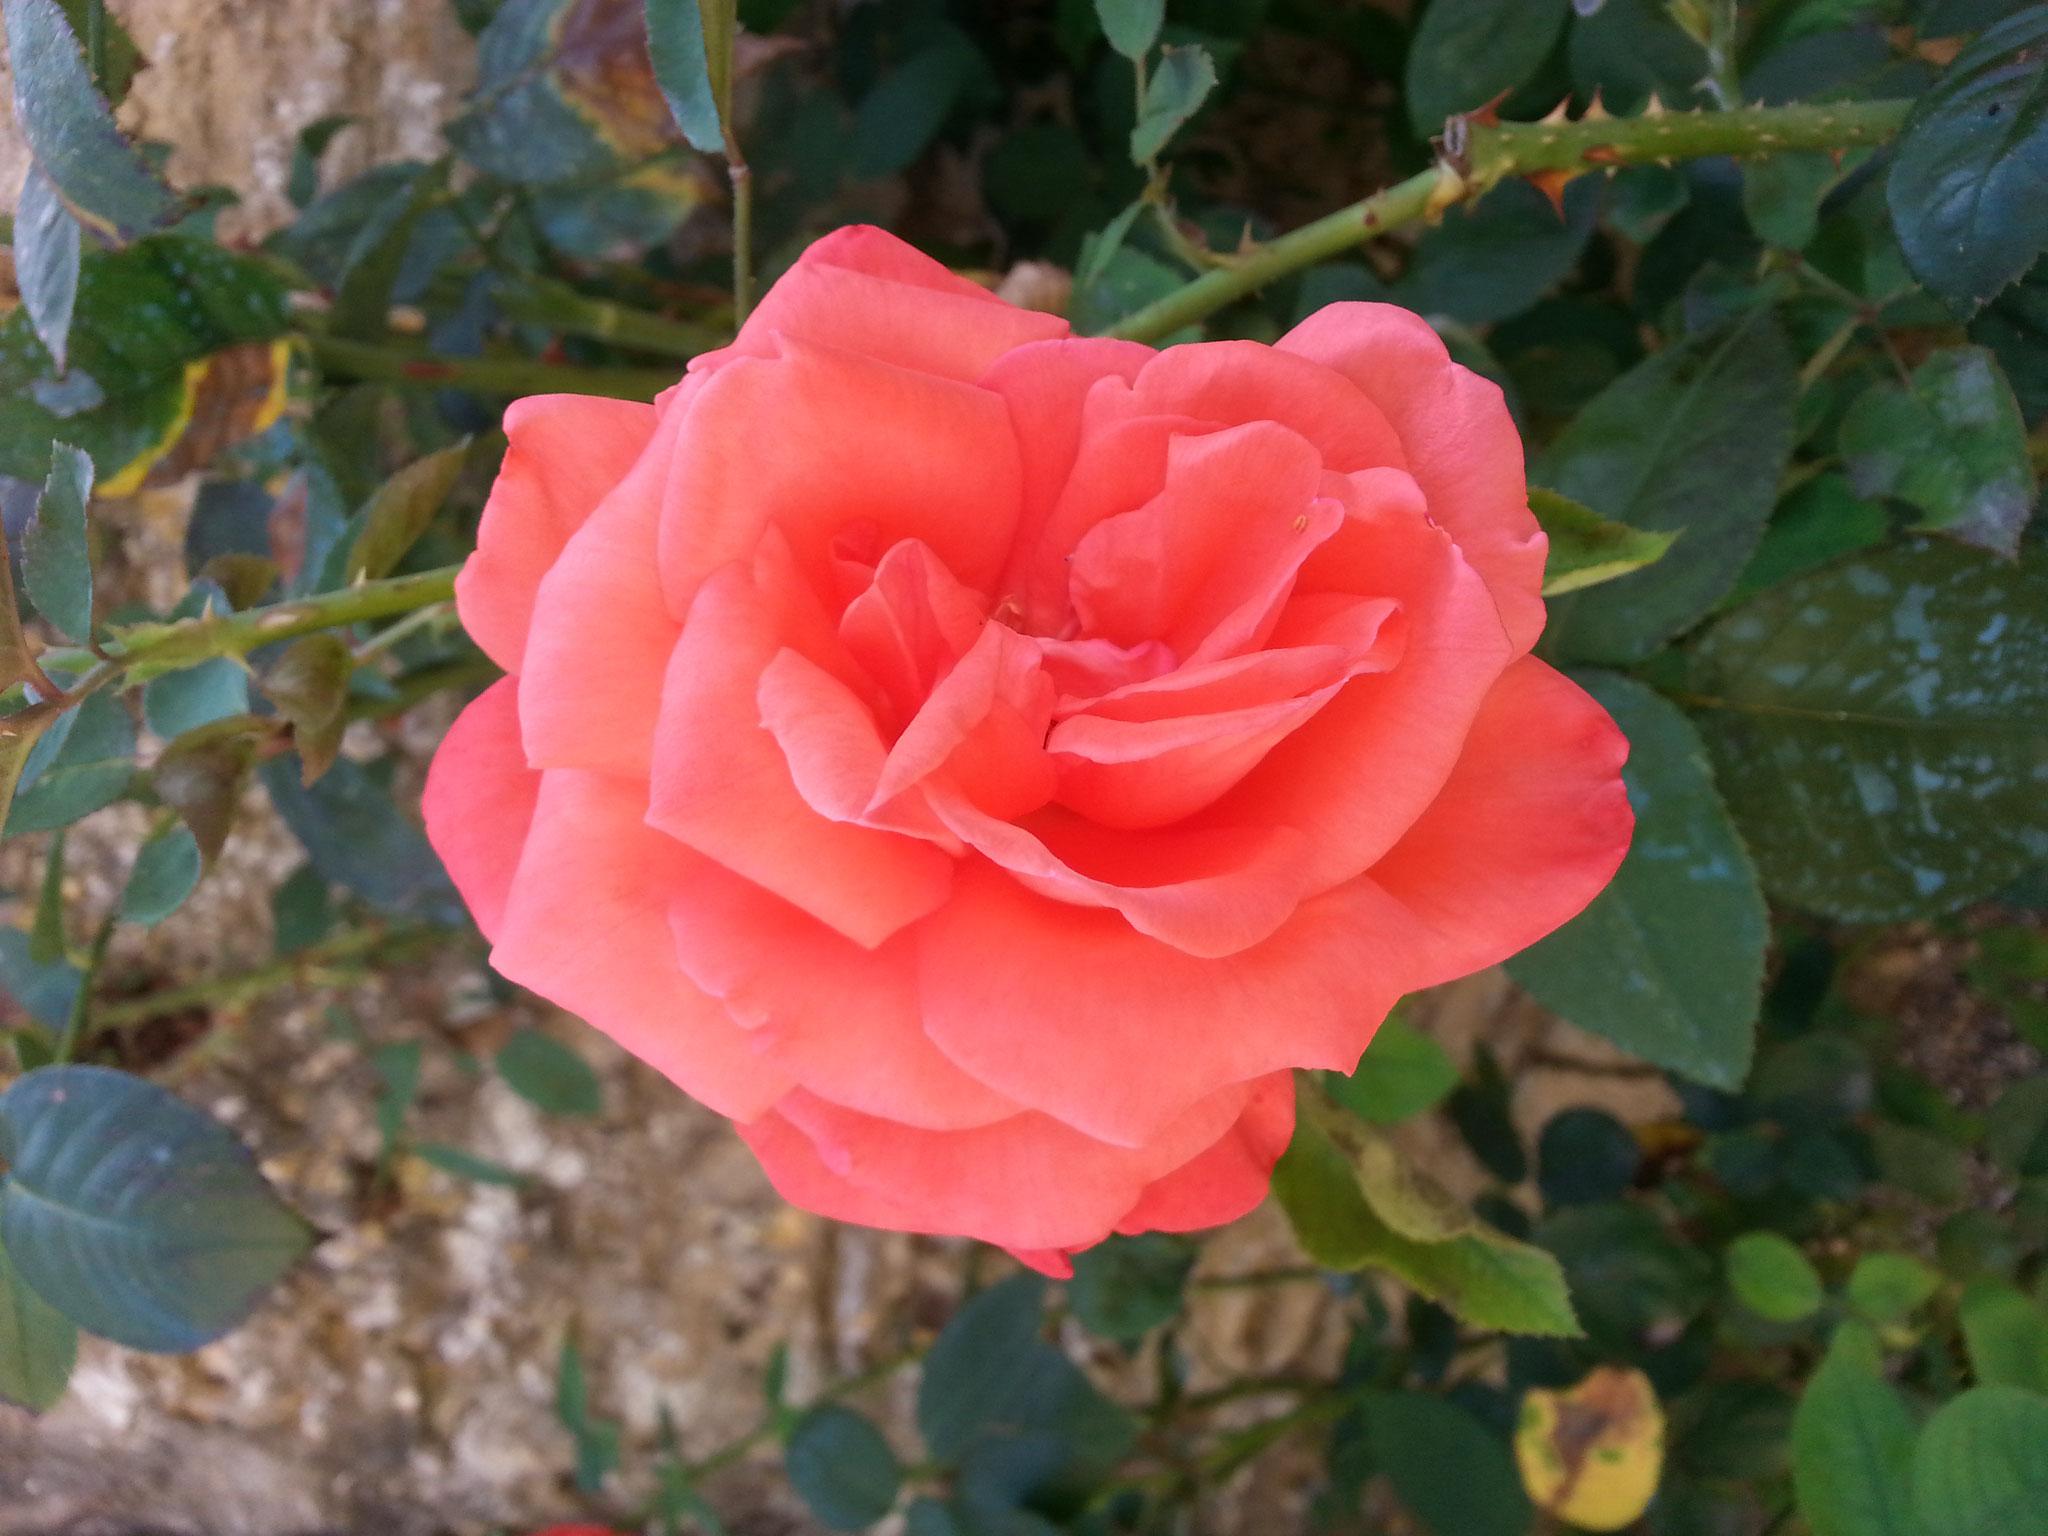 Ô rose !